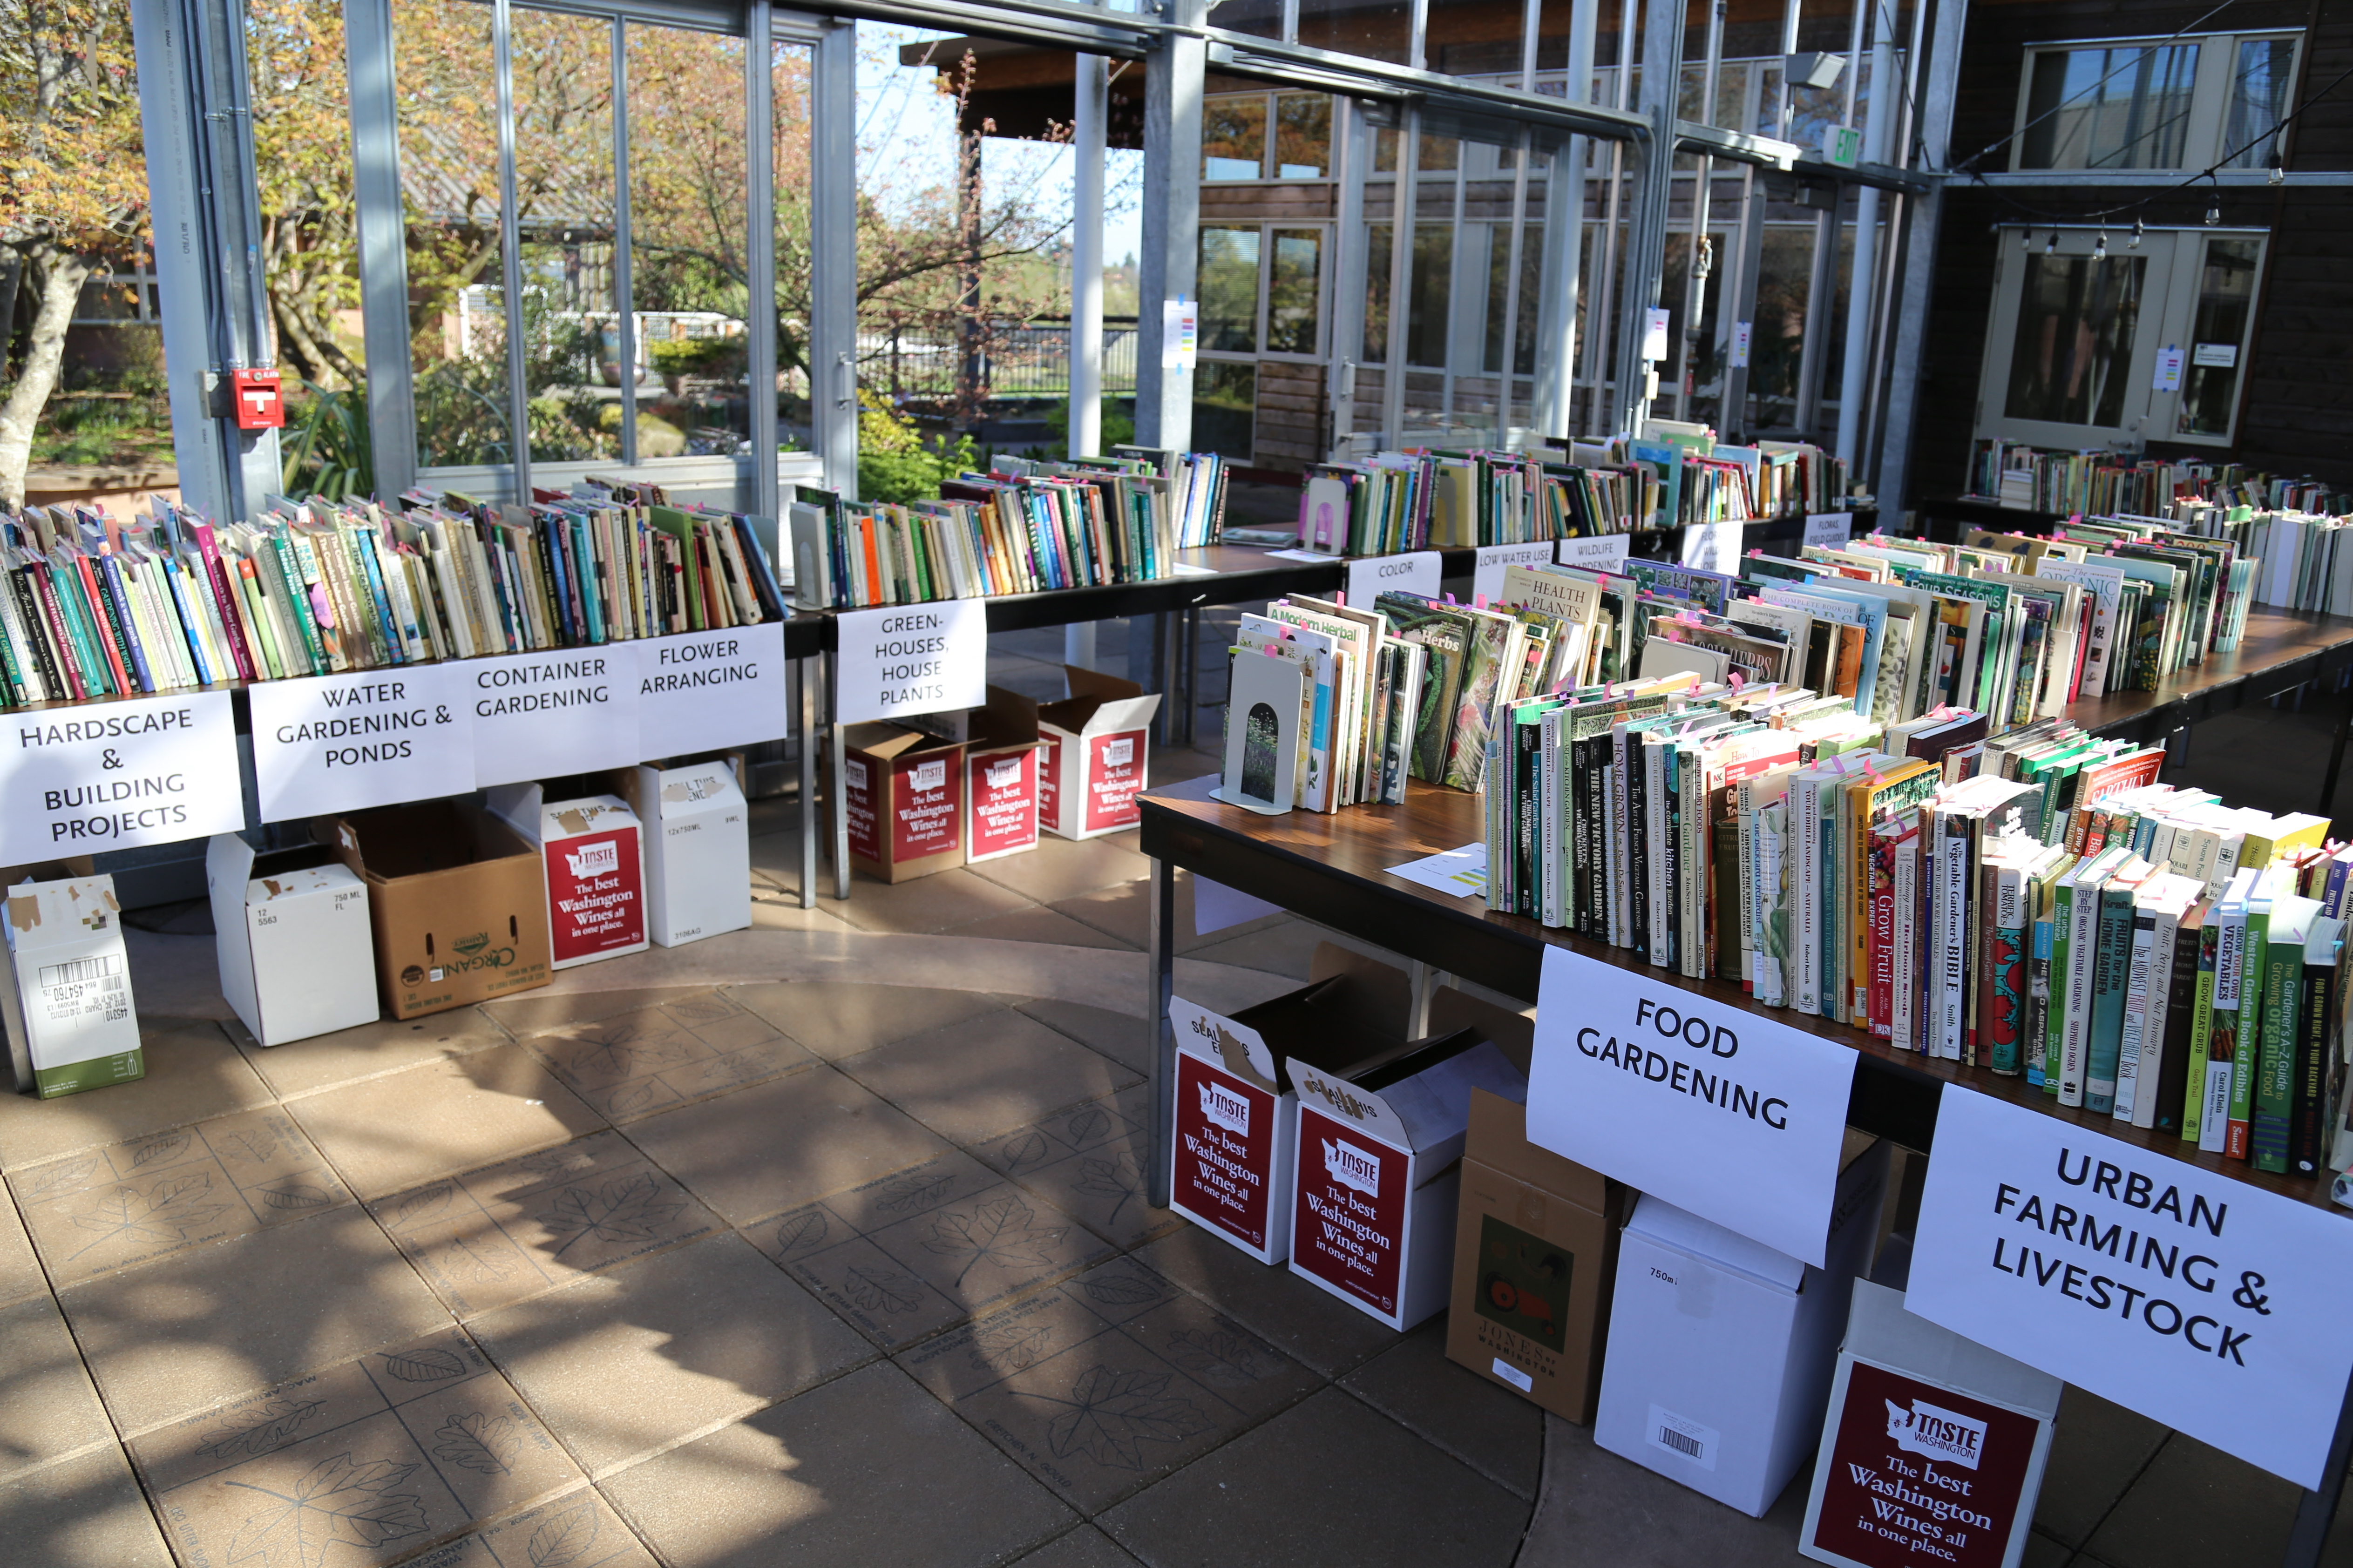 book sale offerings